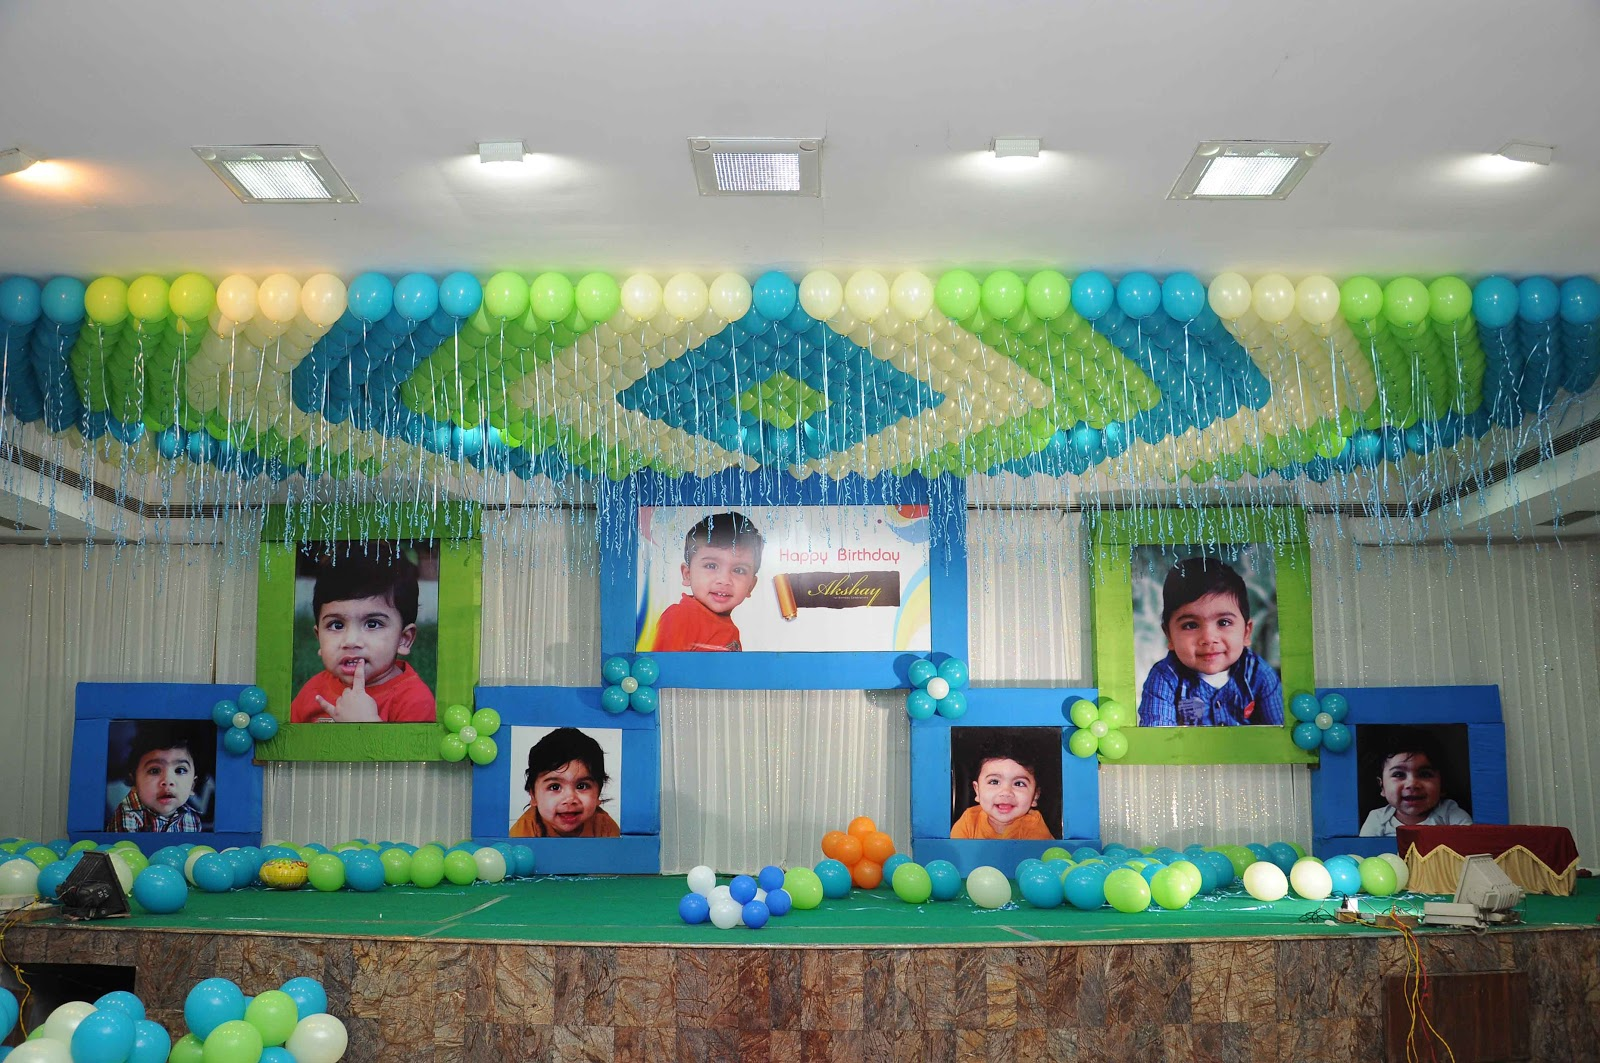 Balloons Decoration Hd Images Walljdi Org